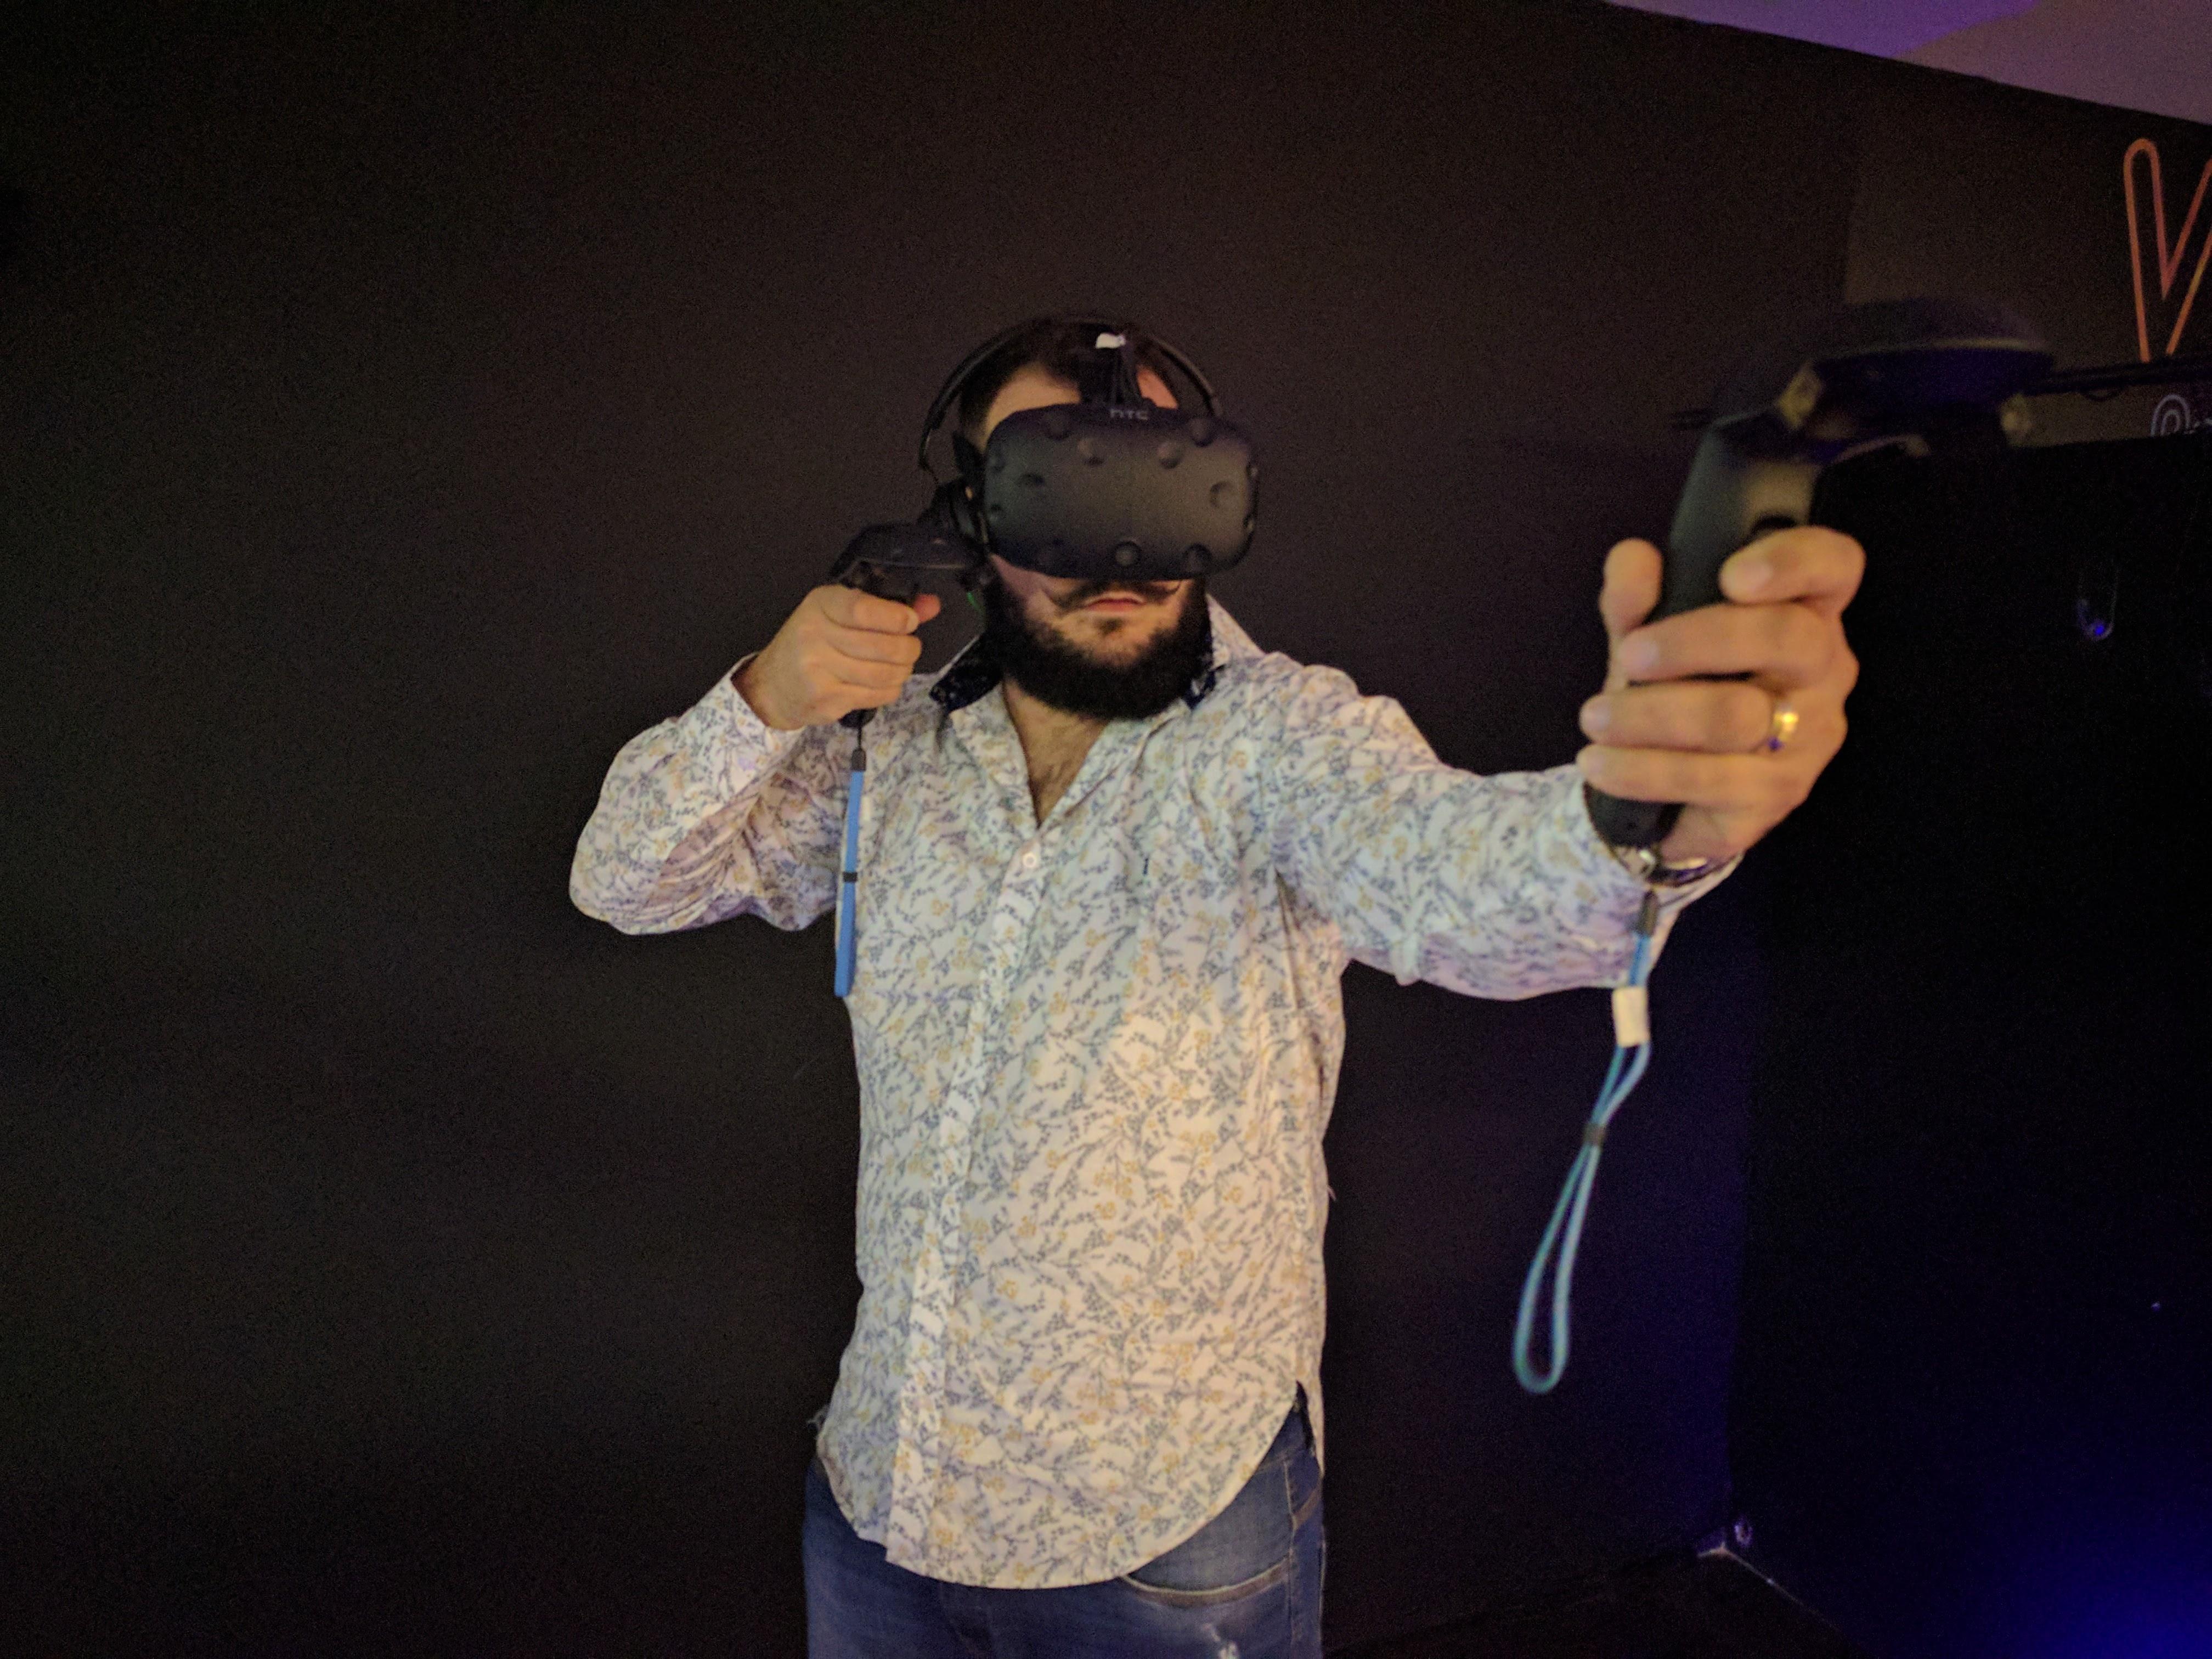 Rio Design Barra VR Experience